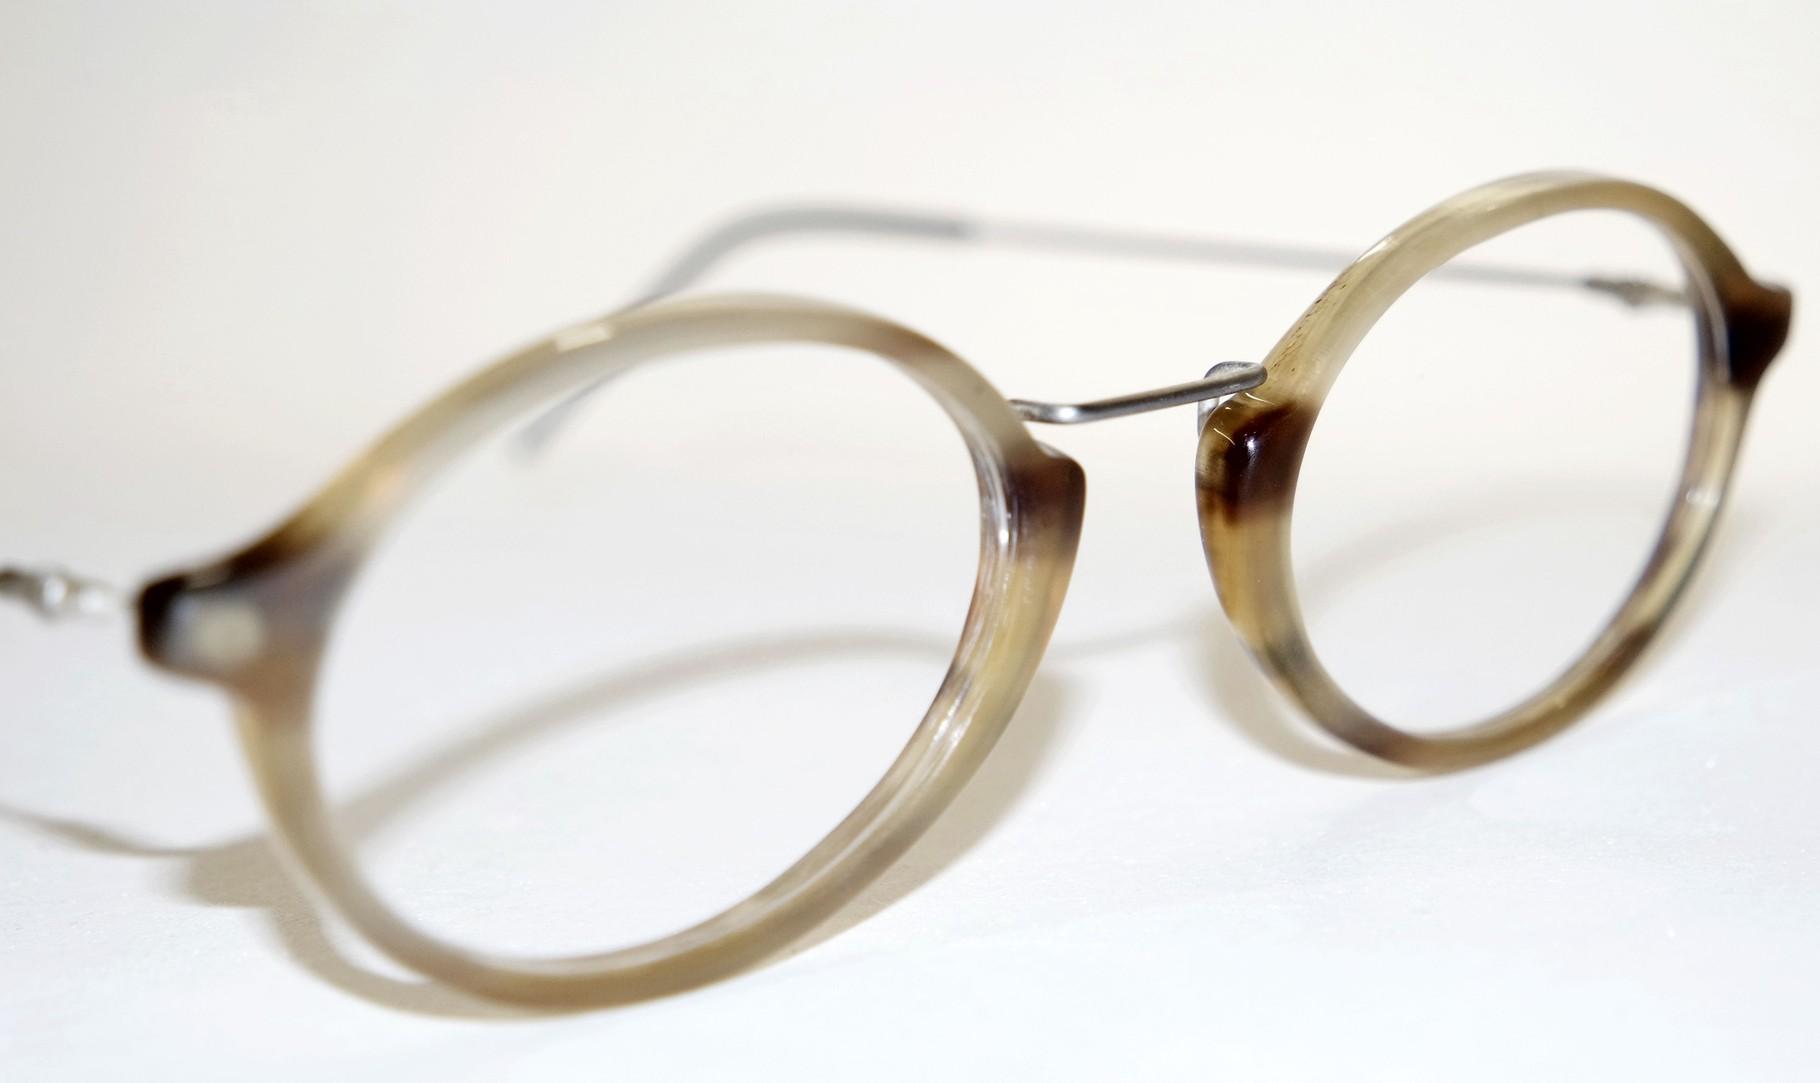 Brille aus Büffelhorn